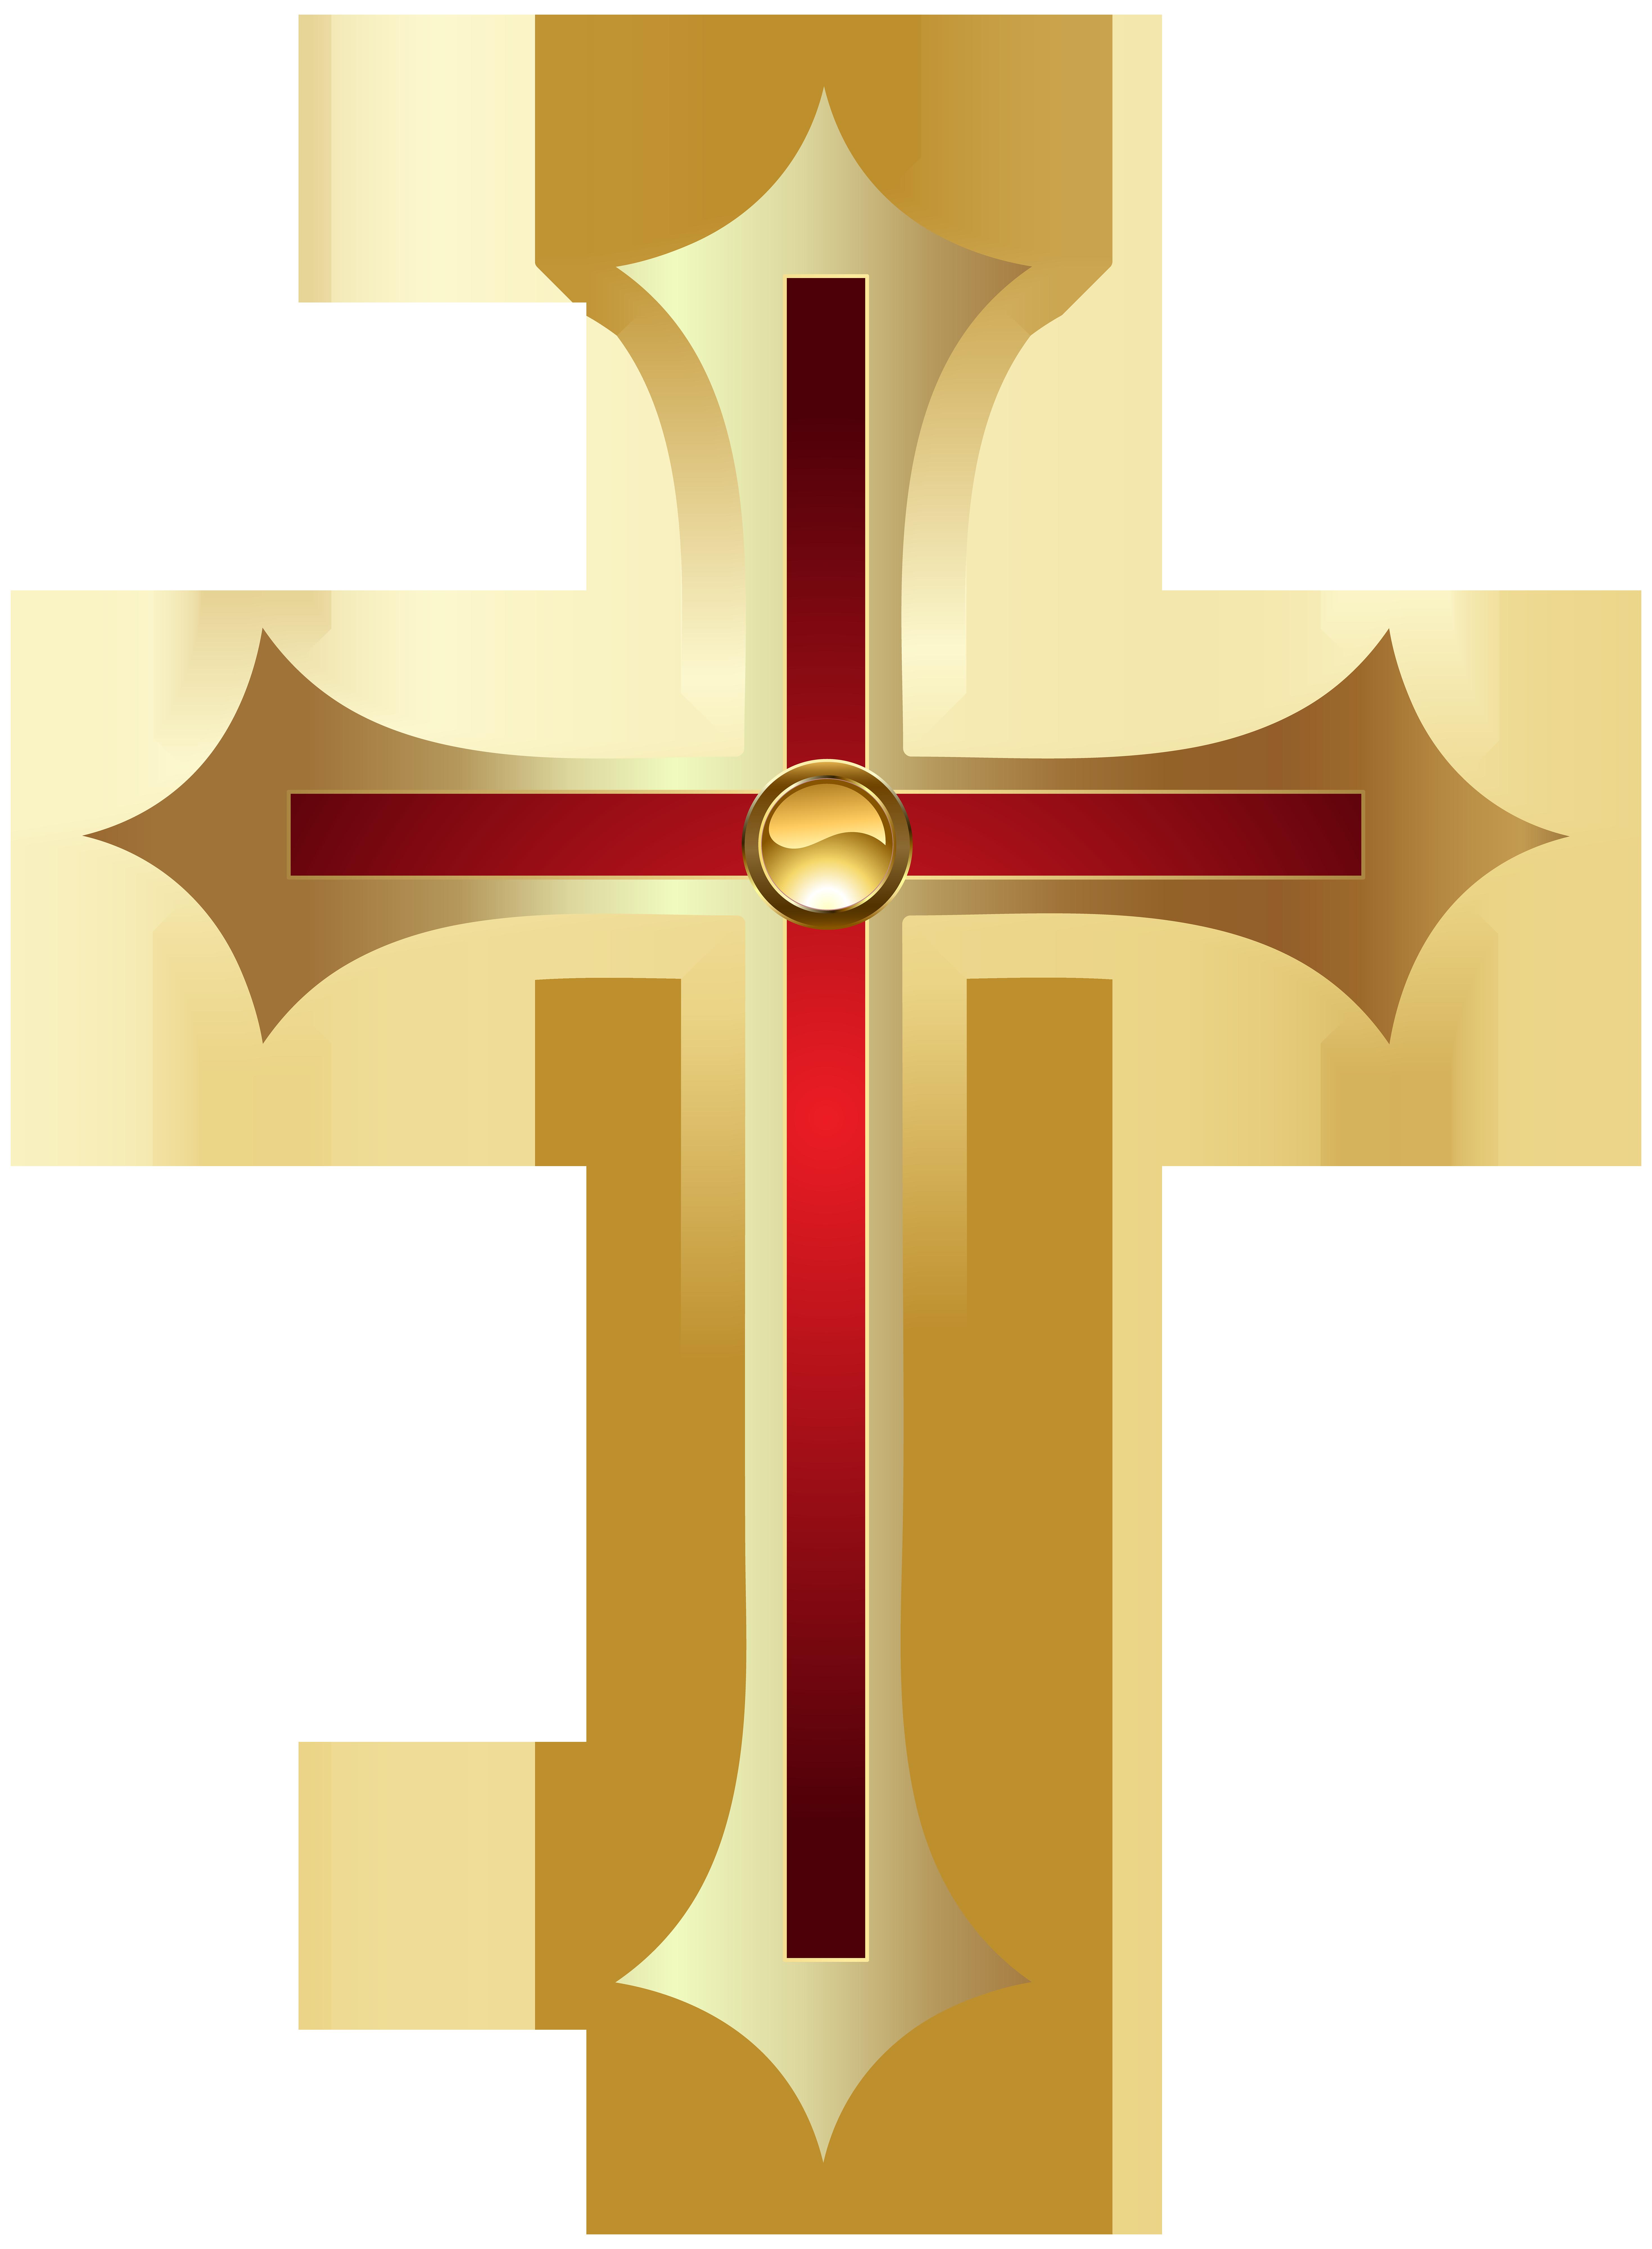 Crucifix clipart cross sun. Christian symbol clip art